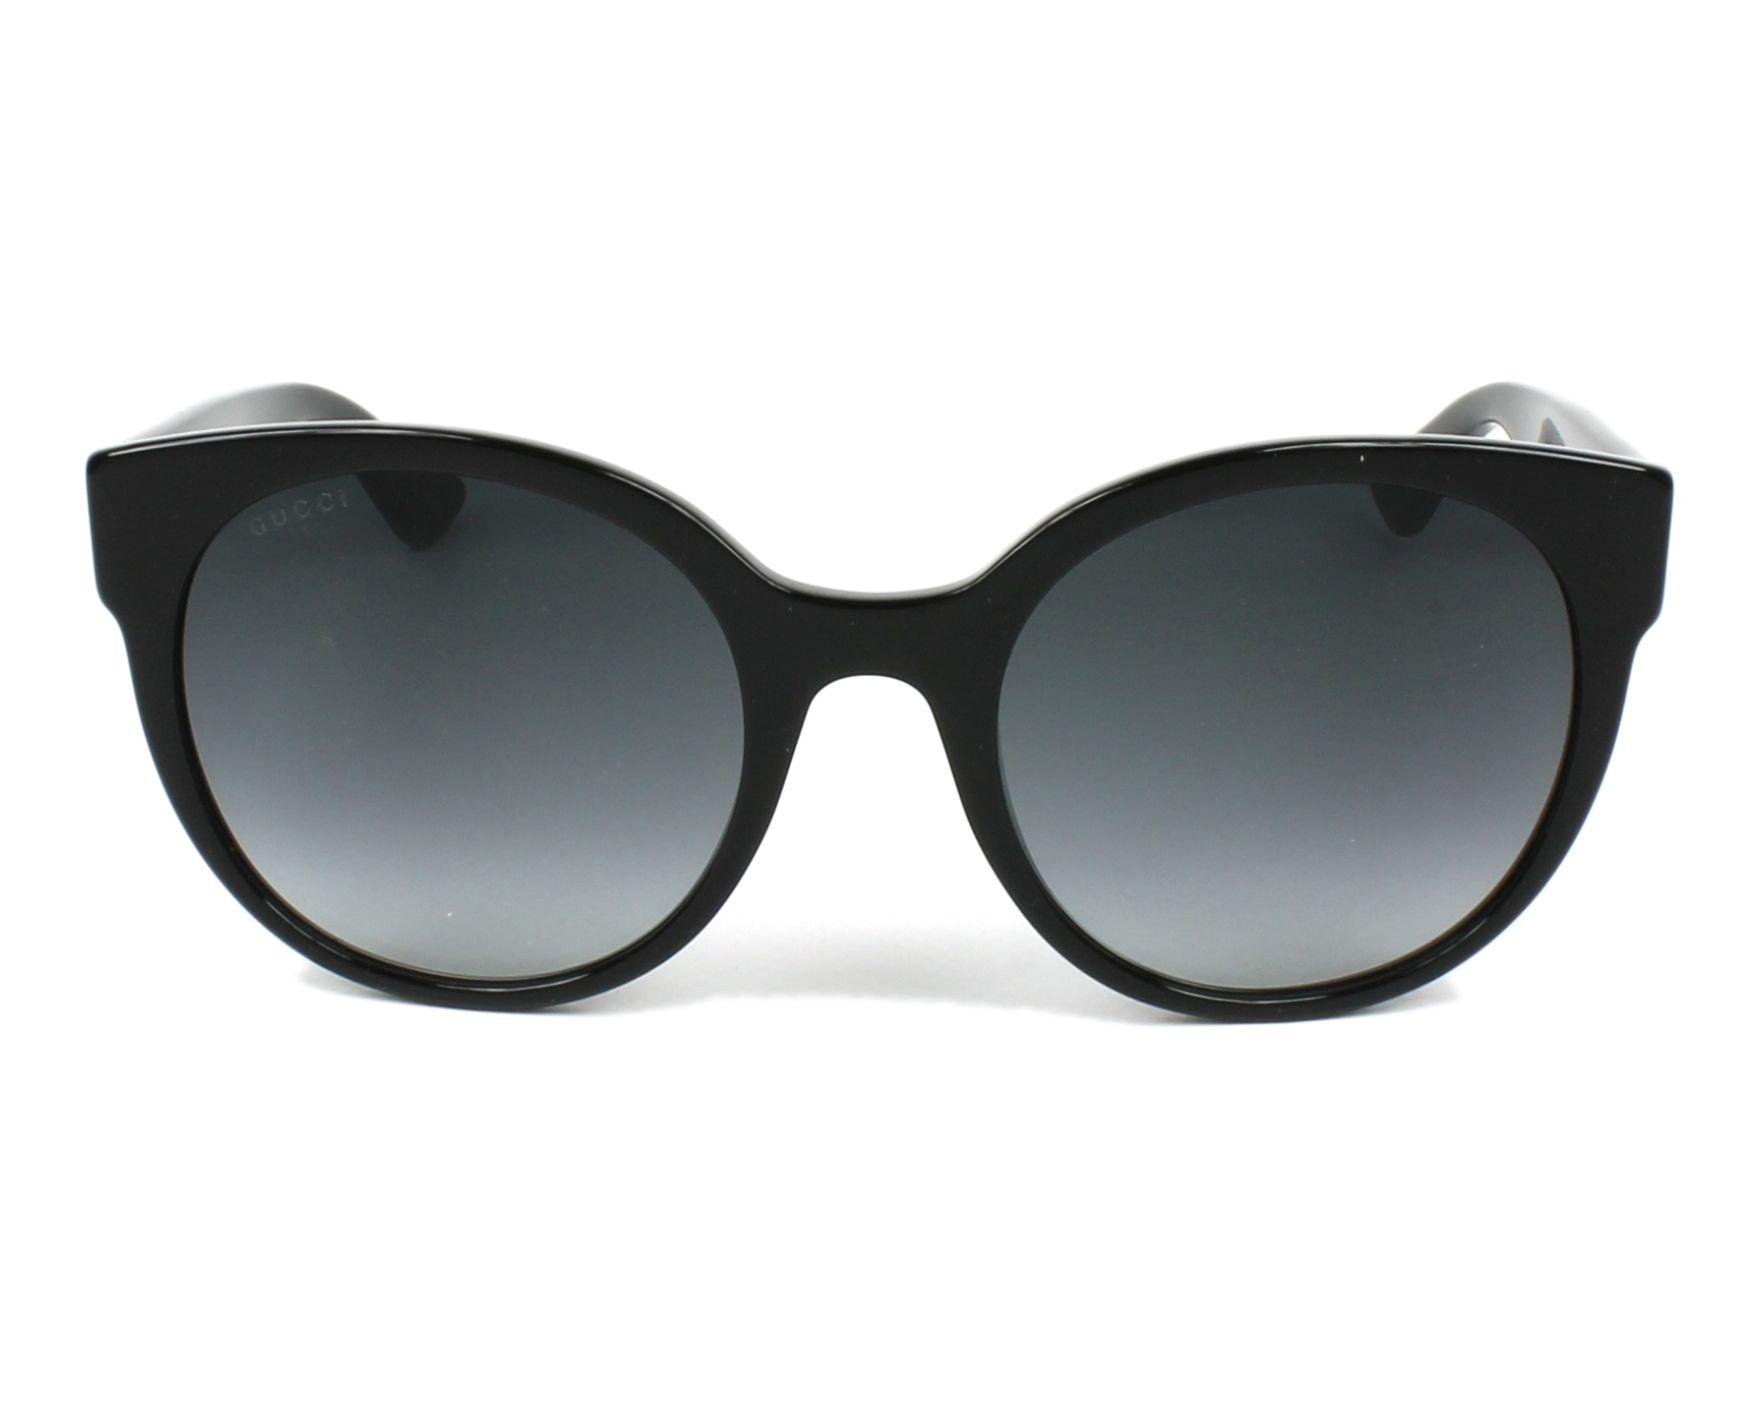 7b1c8ab688 Sunglasses Gucci GG-0035-S 001 54-22 Black front view